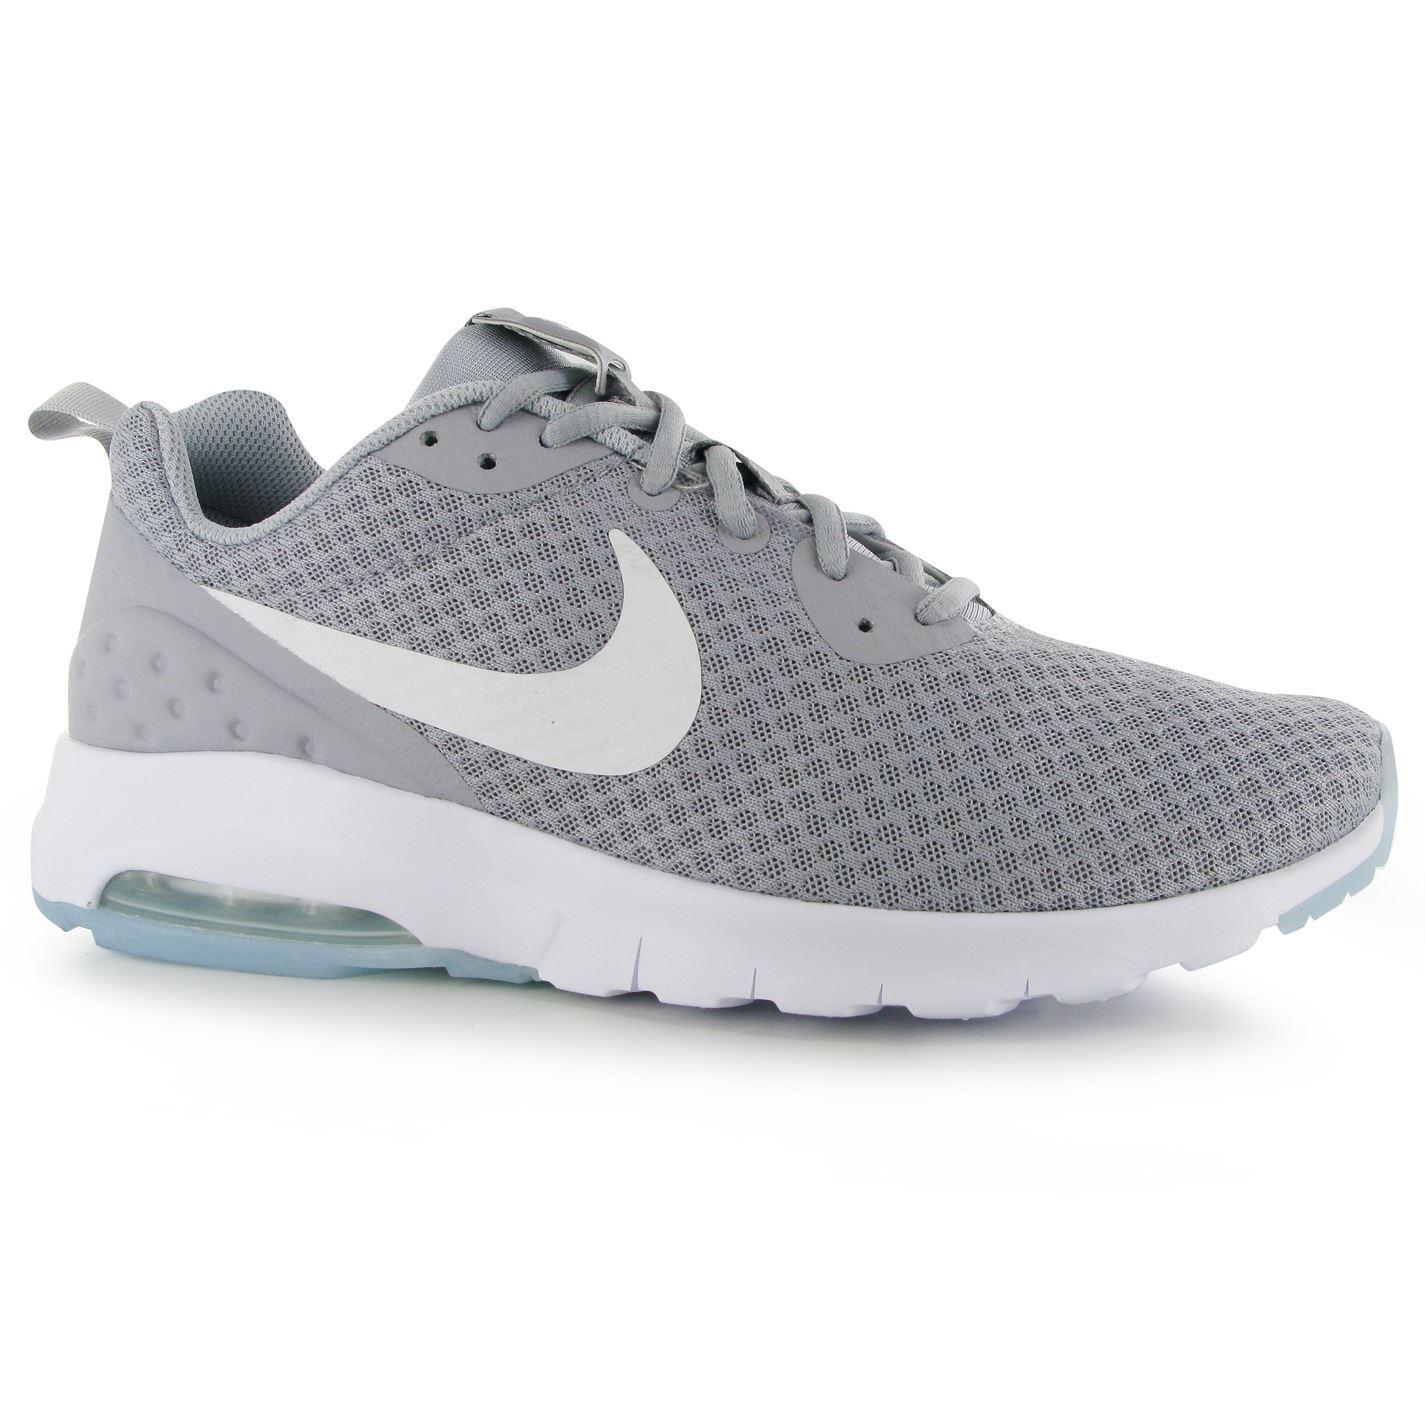 Nike Air Max Motion leggero scarpe da training da uomo bianco/bianco ginnastica